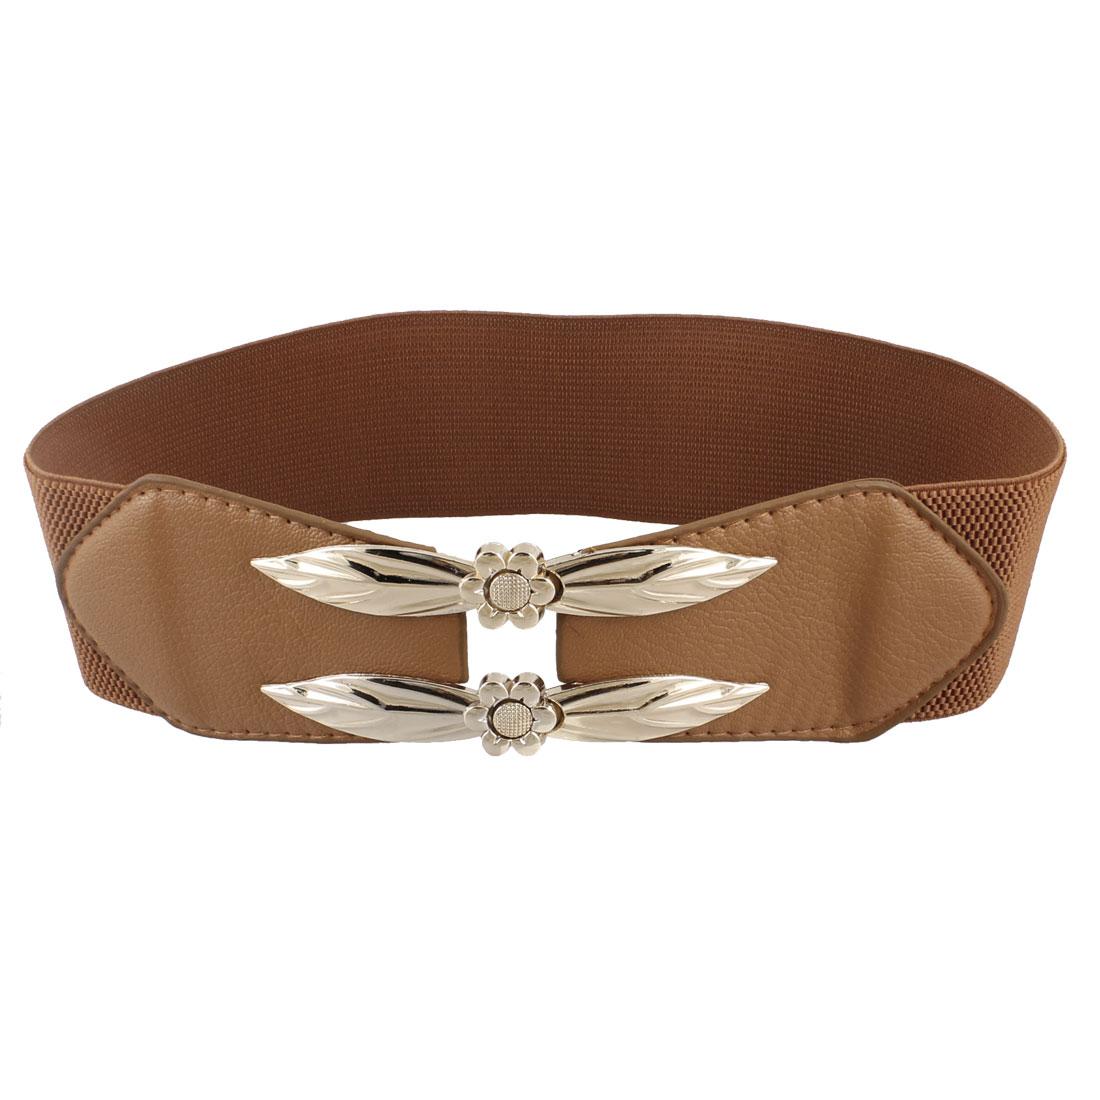 Elastic Band Flower Shape Interlocking Buckle Waist Belt Brown for Ladies